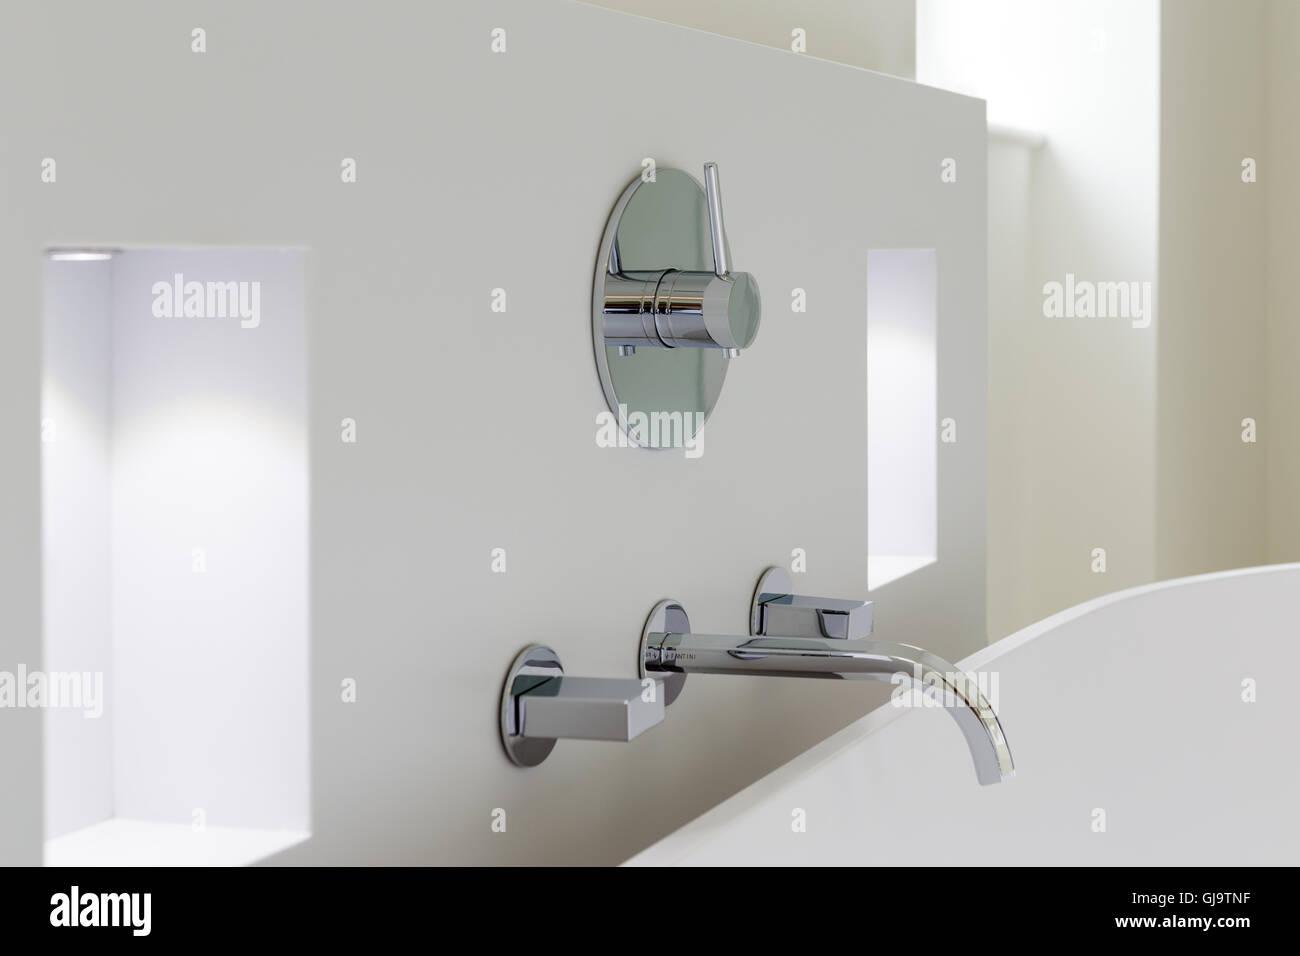 Moderne Stilvolle Badezimmer Armaturen Stockfoto Bild 114543003